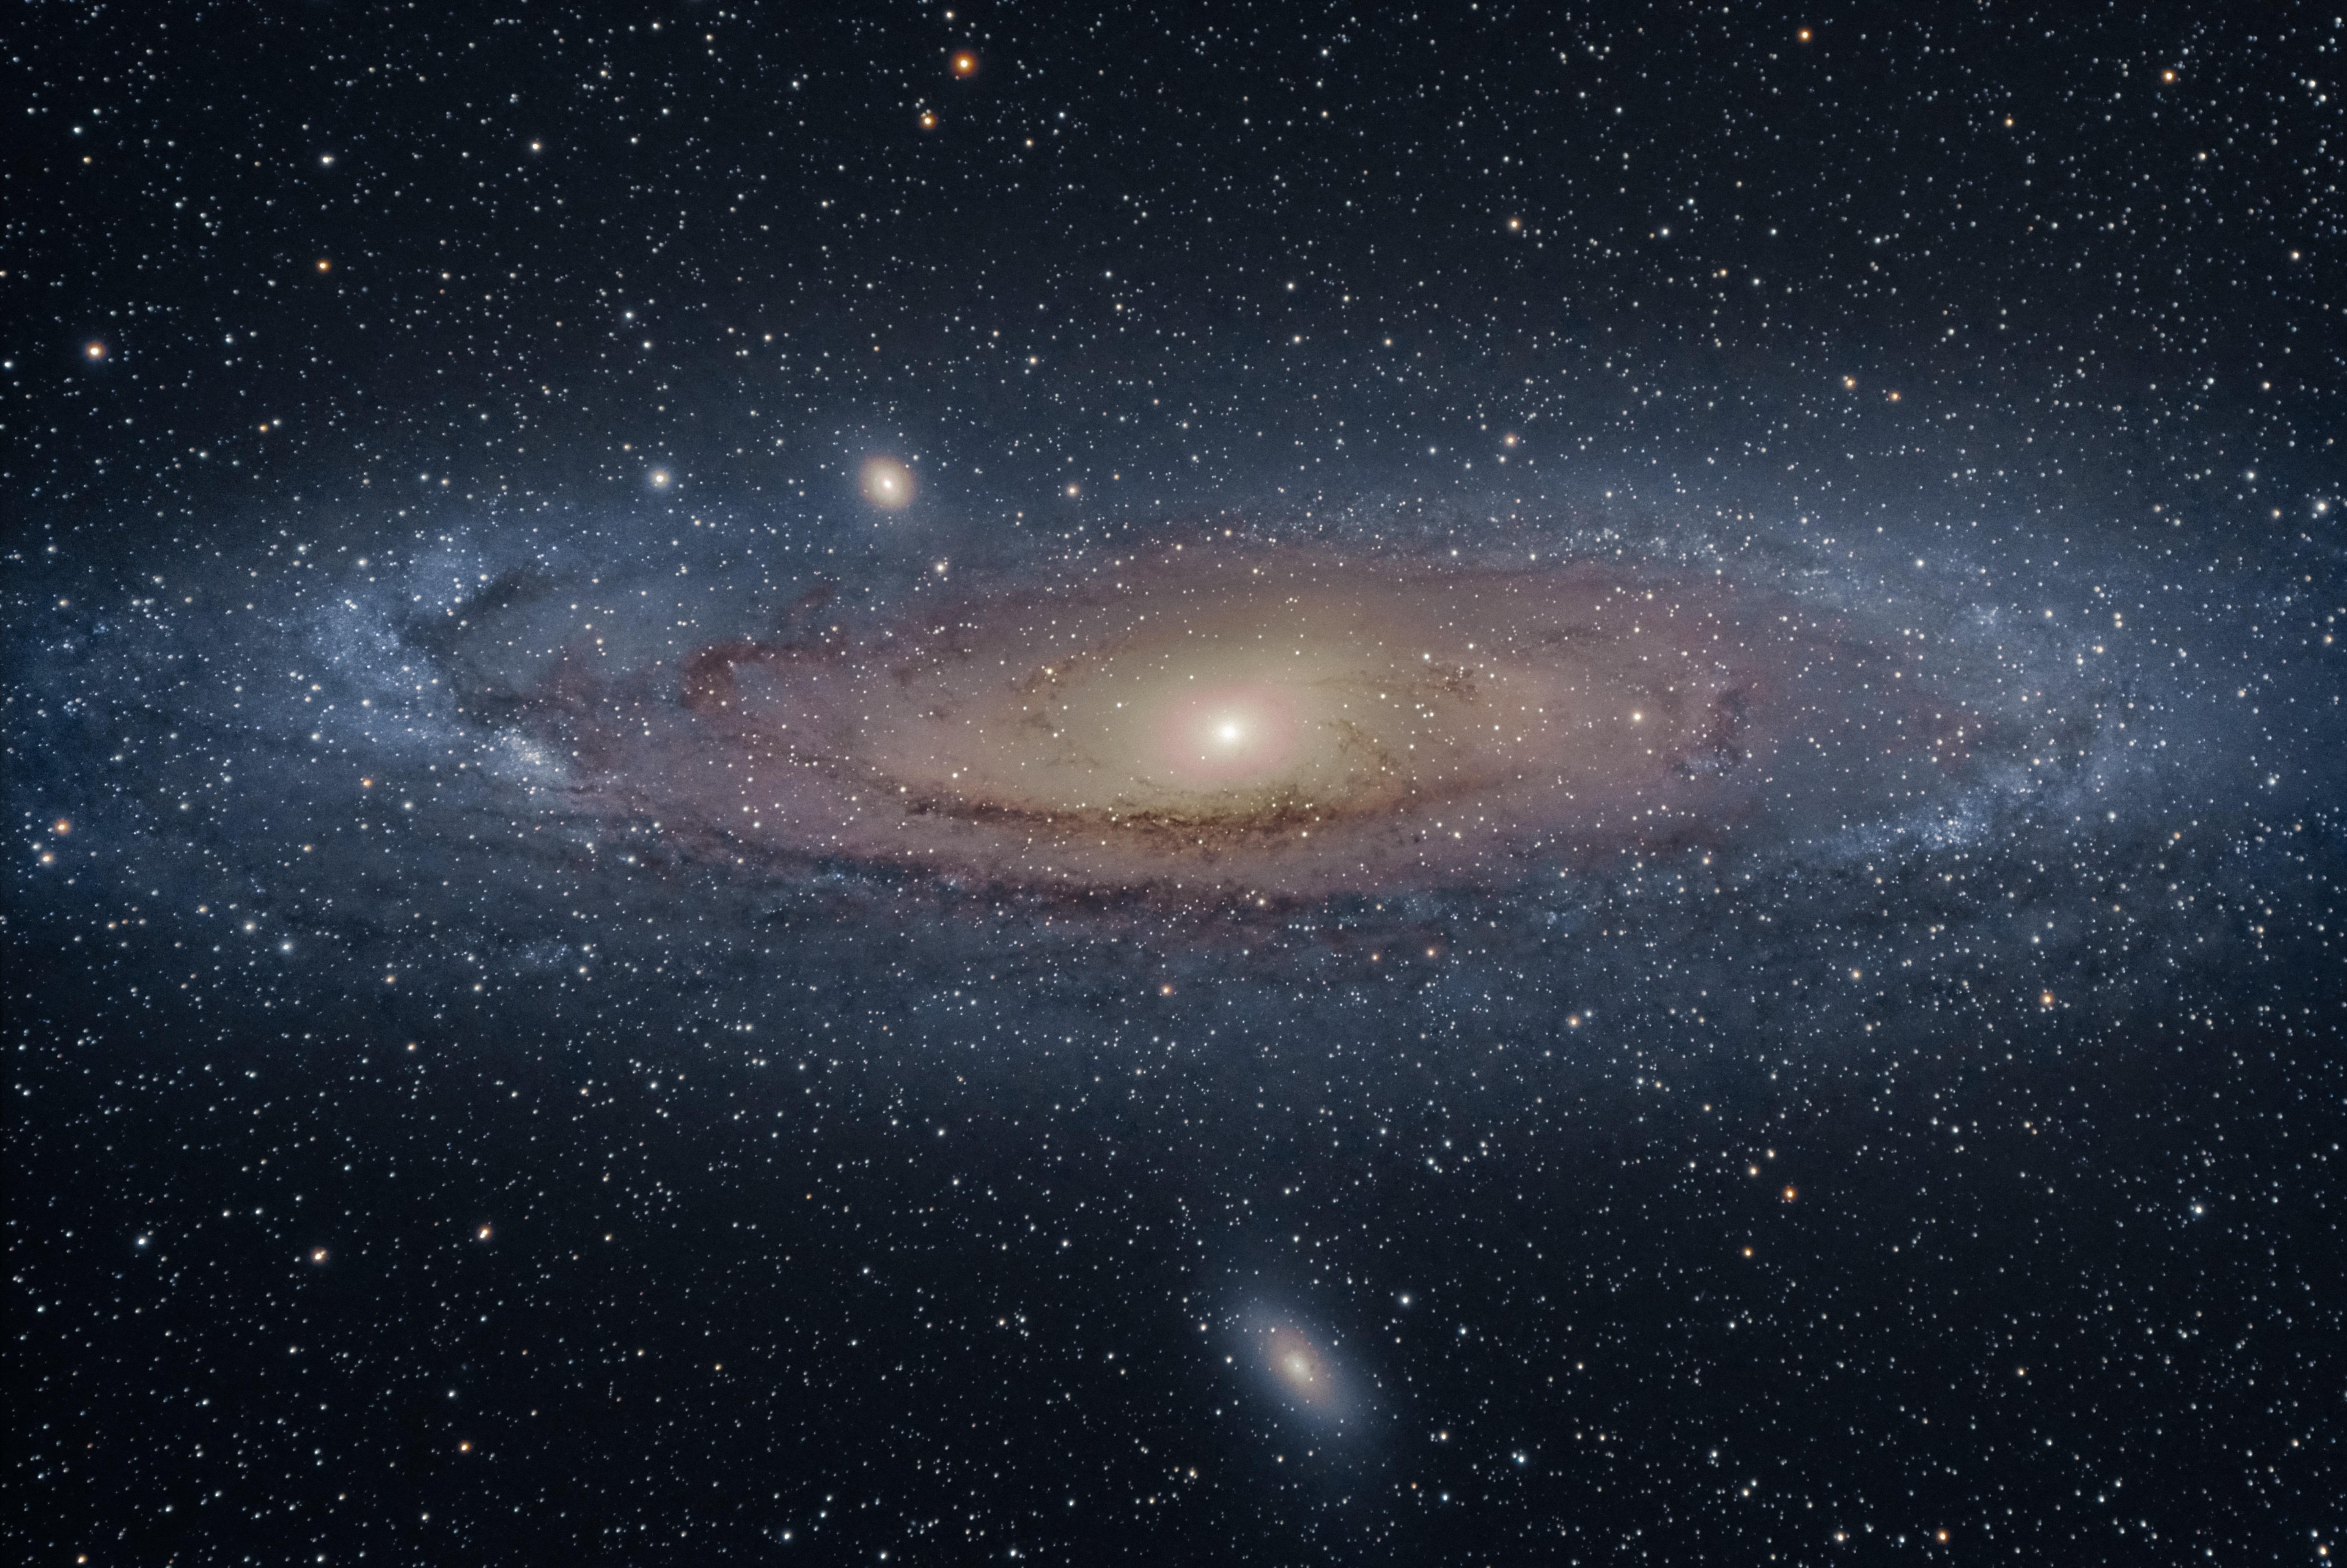 Andromeda Galaxy through Telescope id157040 Buzzergcom 5971x3989